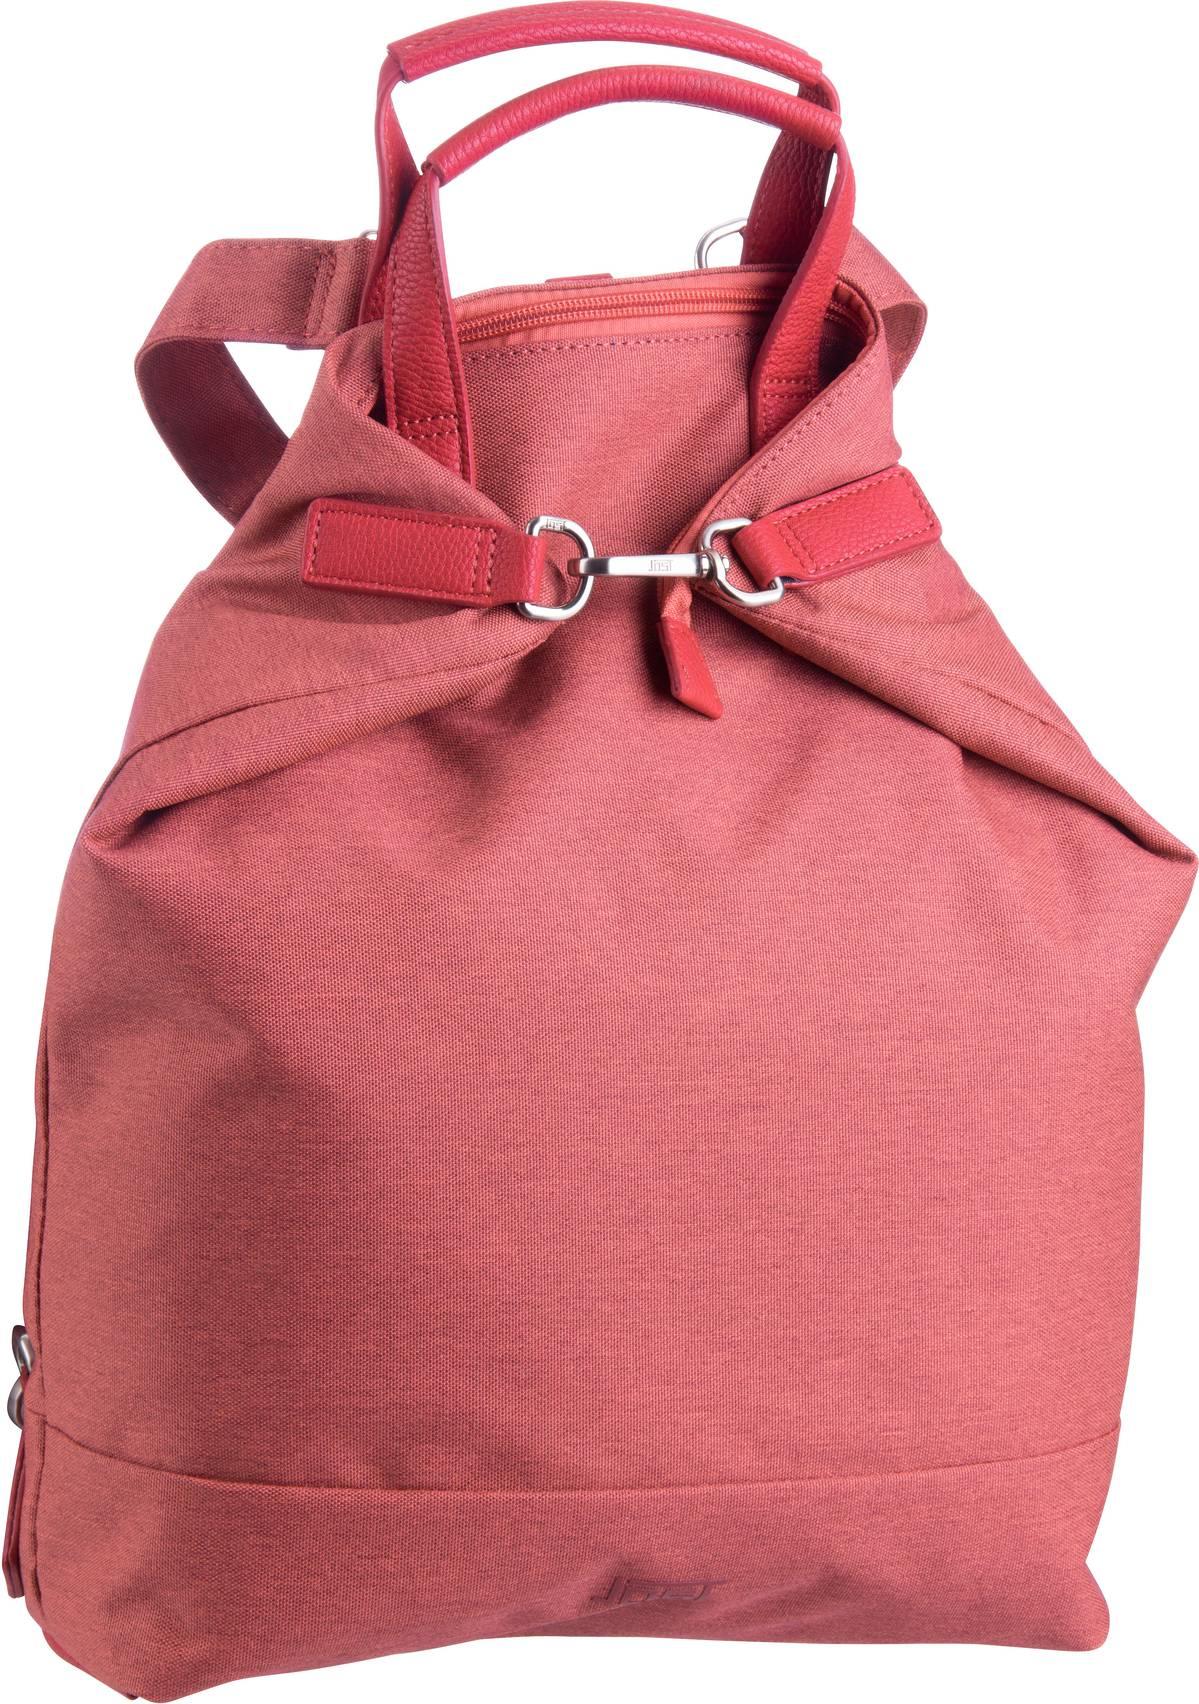 Jost Laptoprucksack 1127 X-Change Bag S k